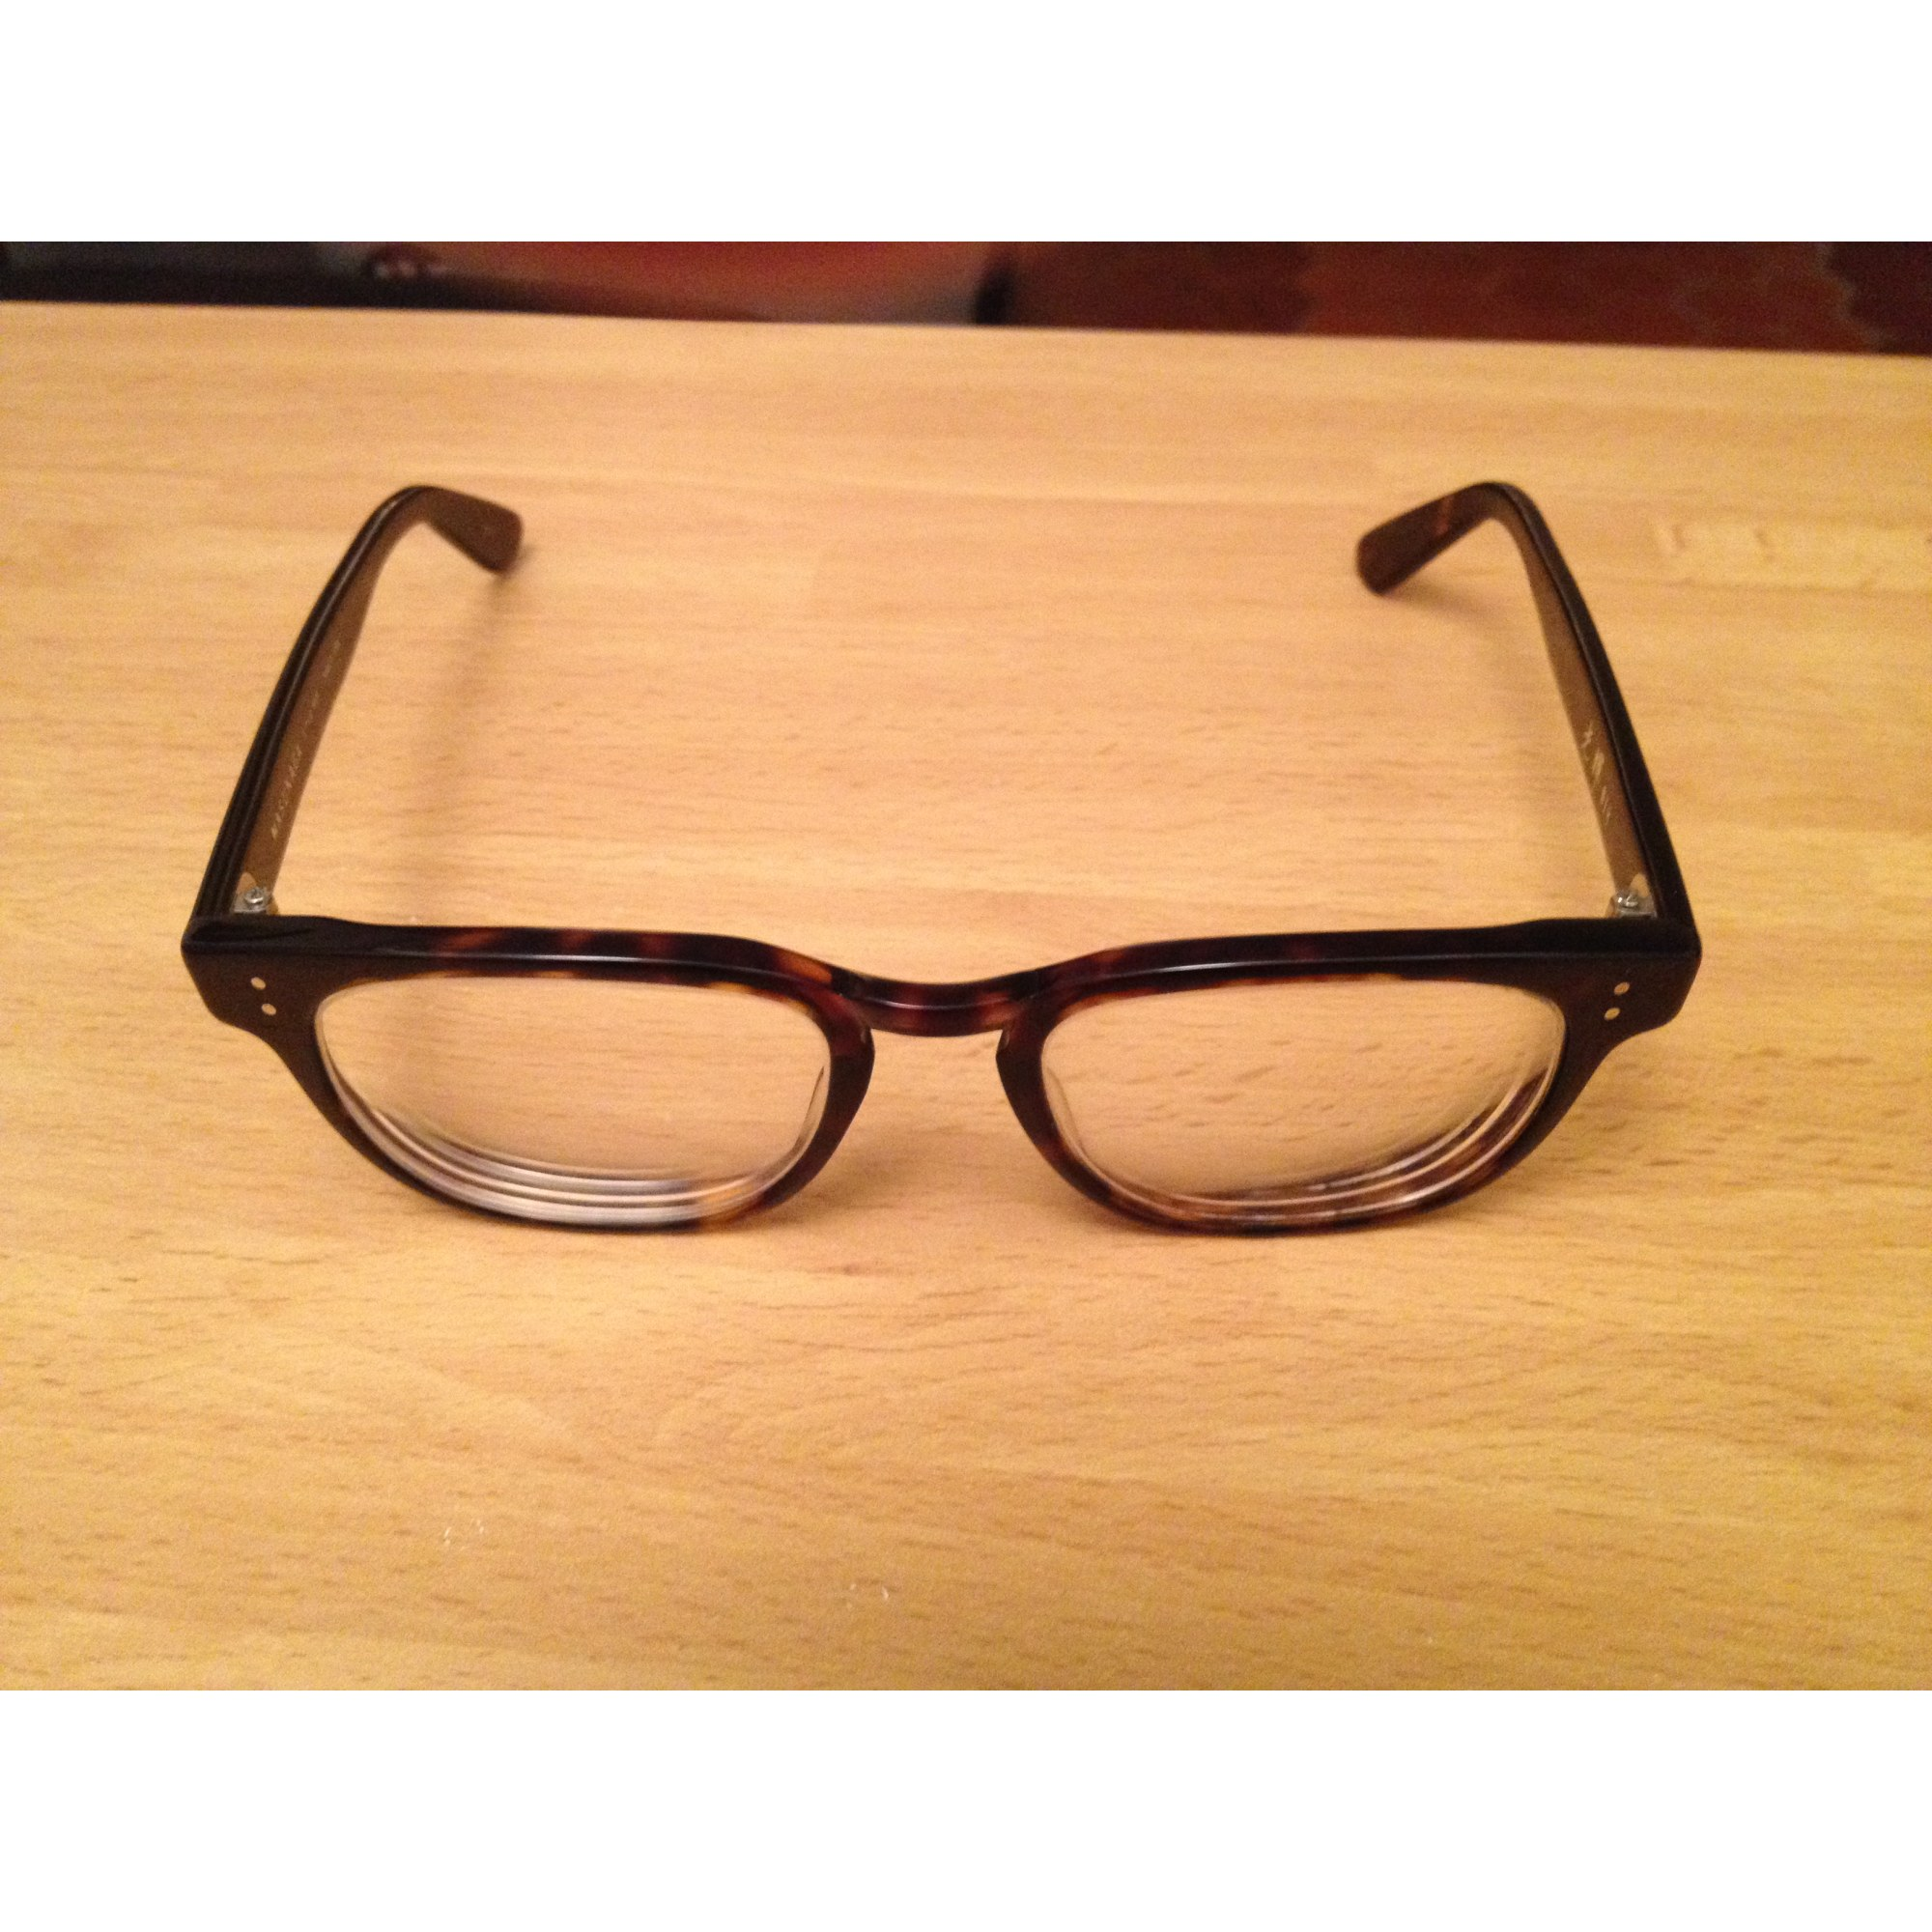 4e40f10be55c44 Monture de lunettes MASUNAGA marron - 2434920